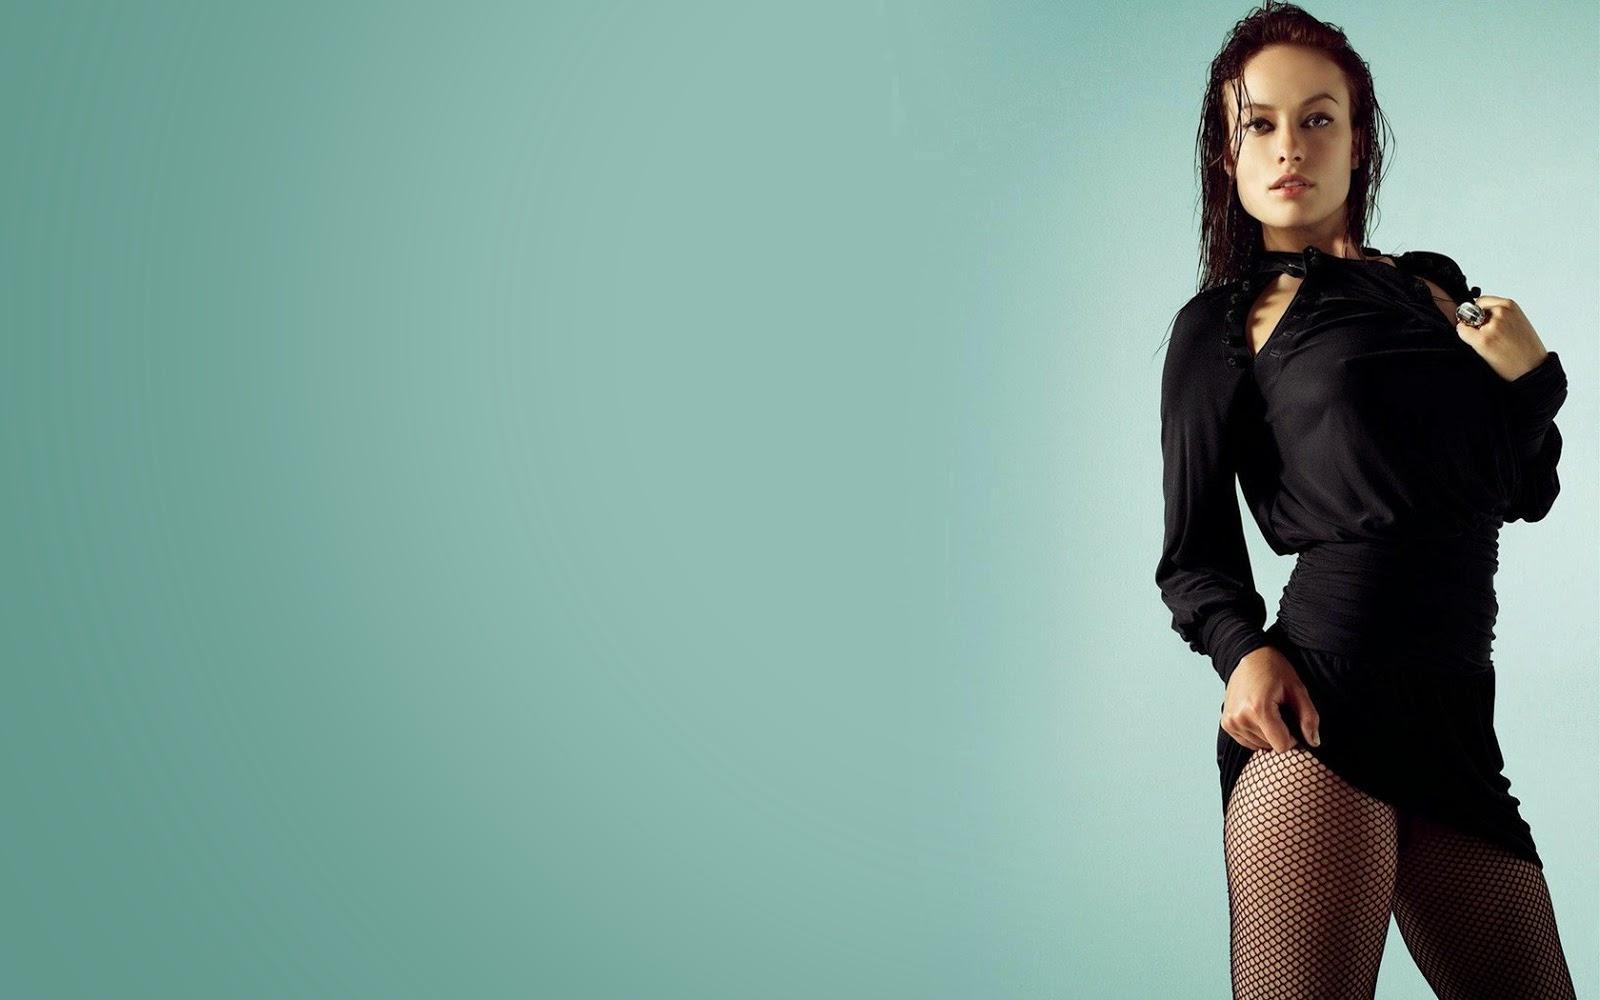 Olivia Wilde Wallpaper 1080P